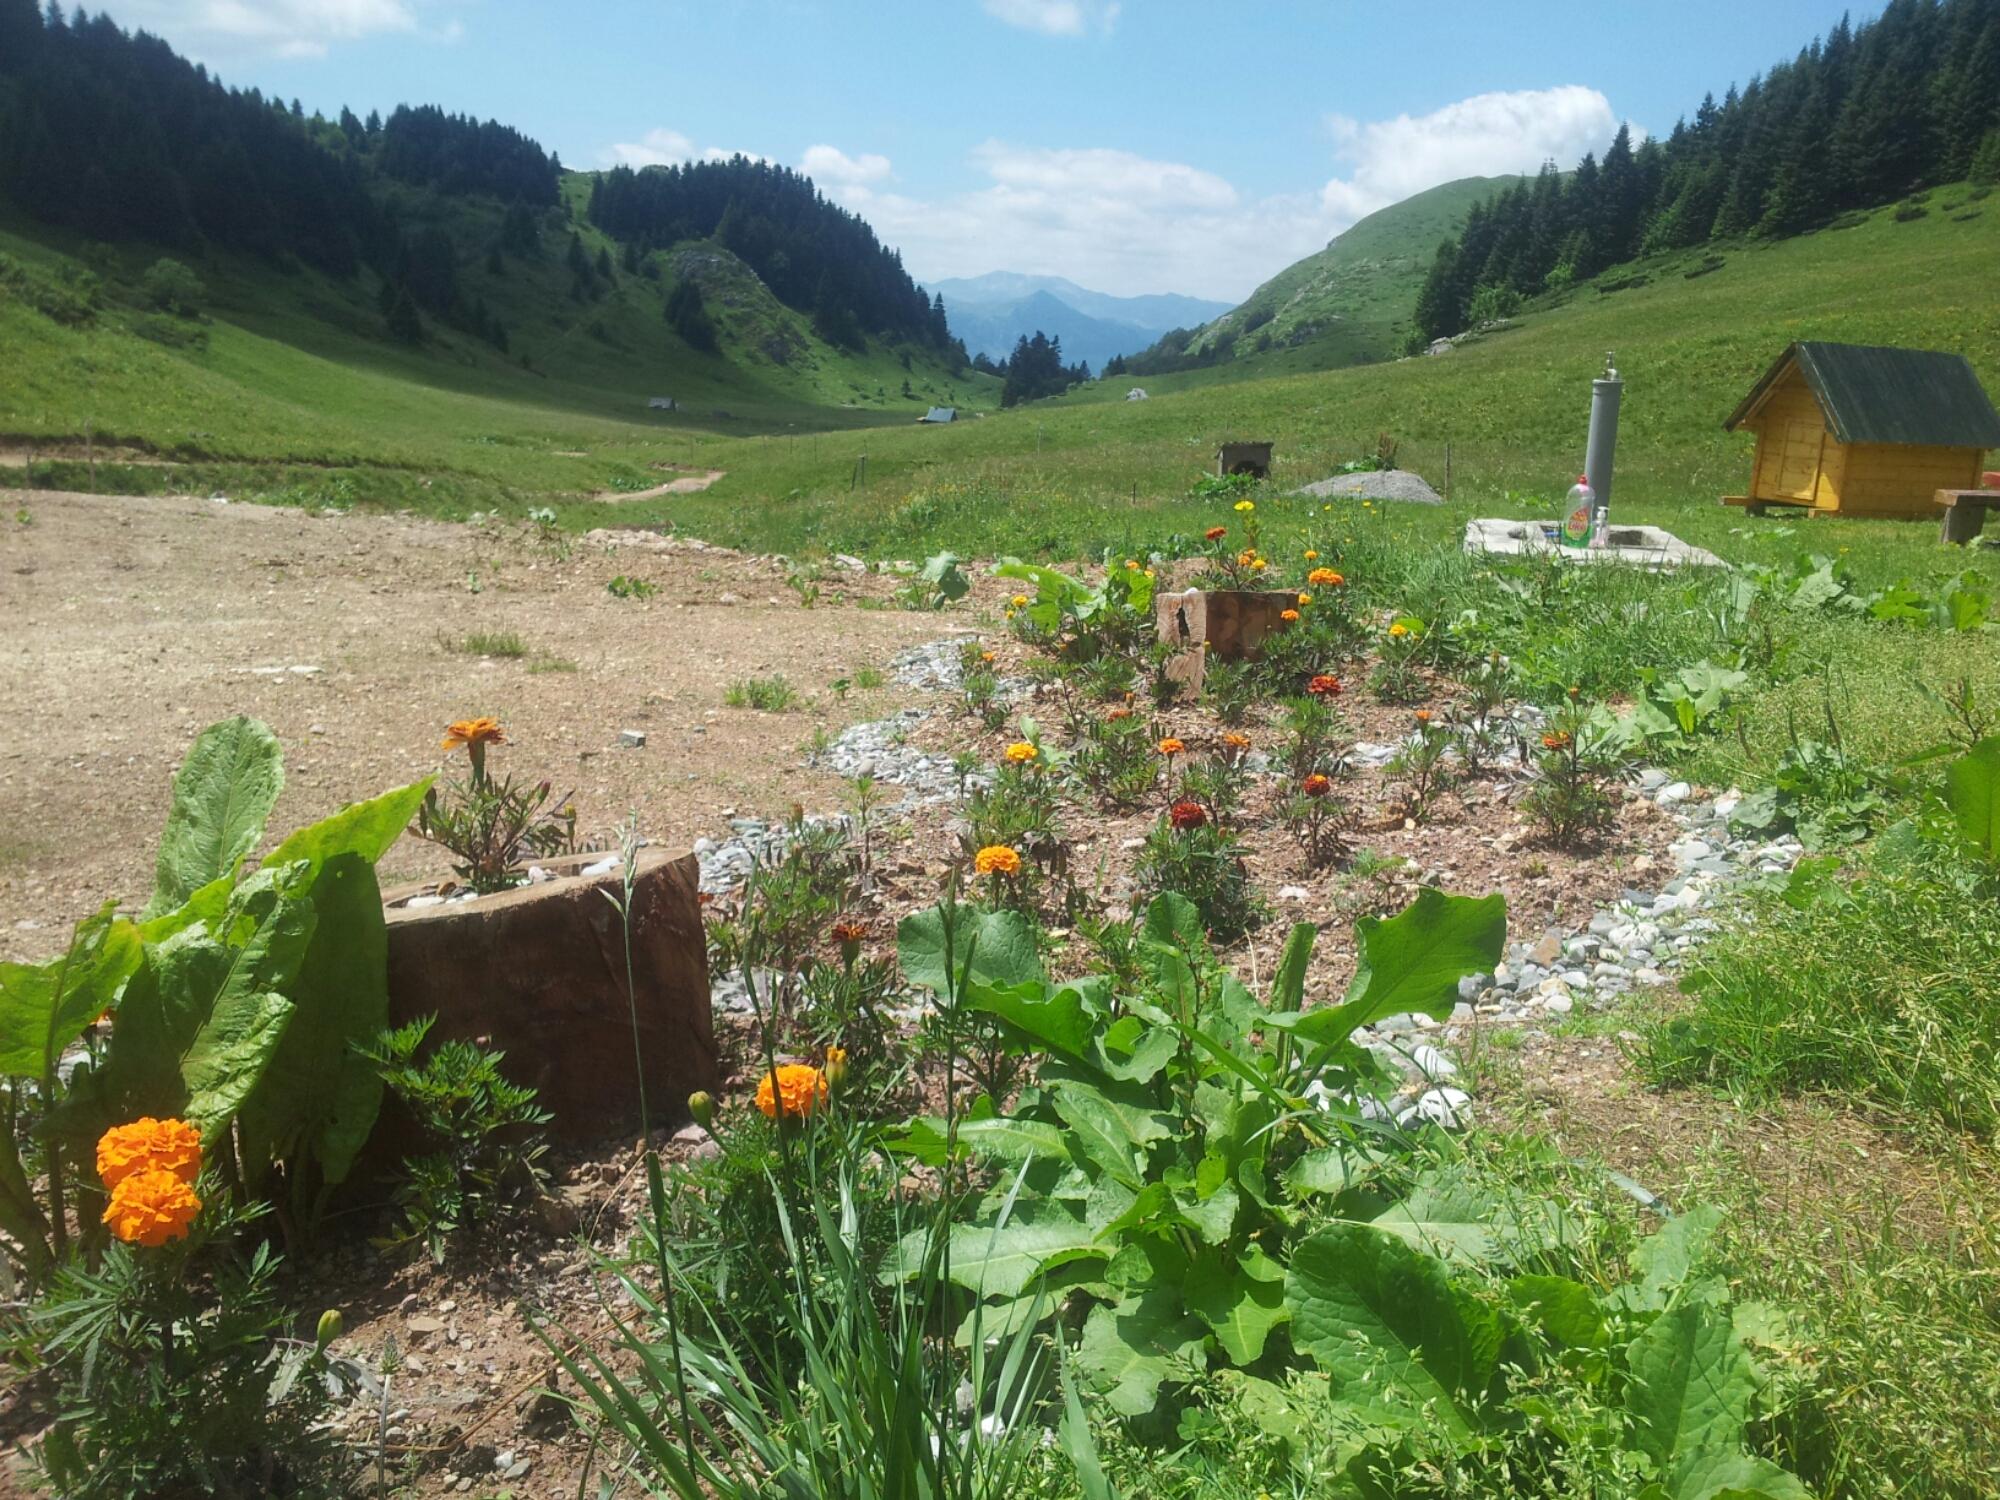 De tuin van Kolibe Damjanovića